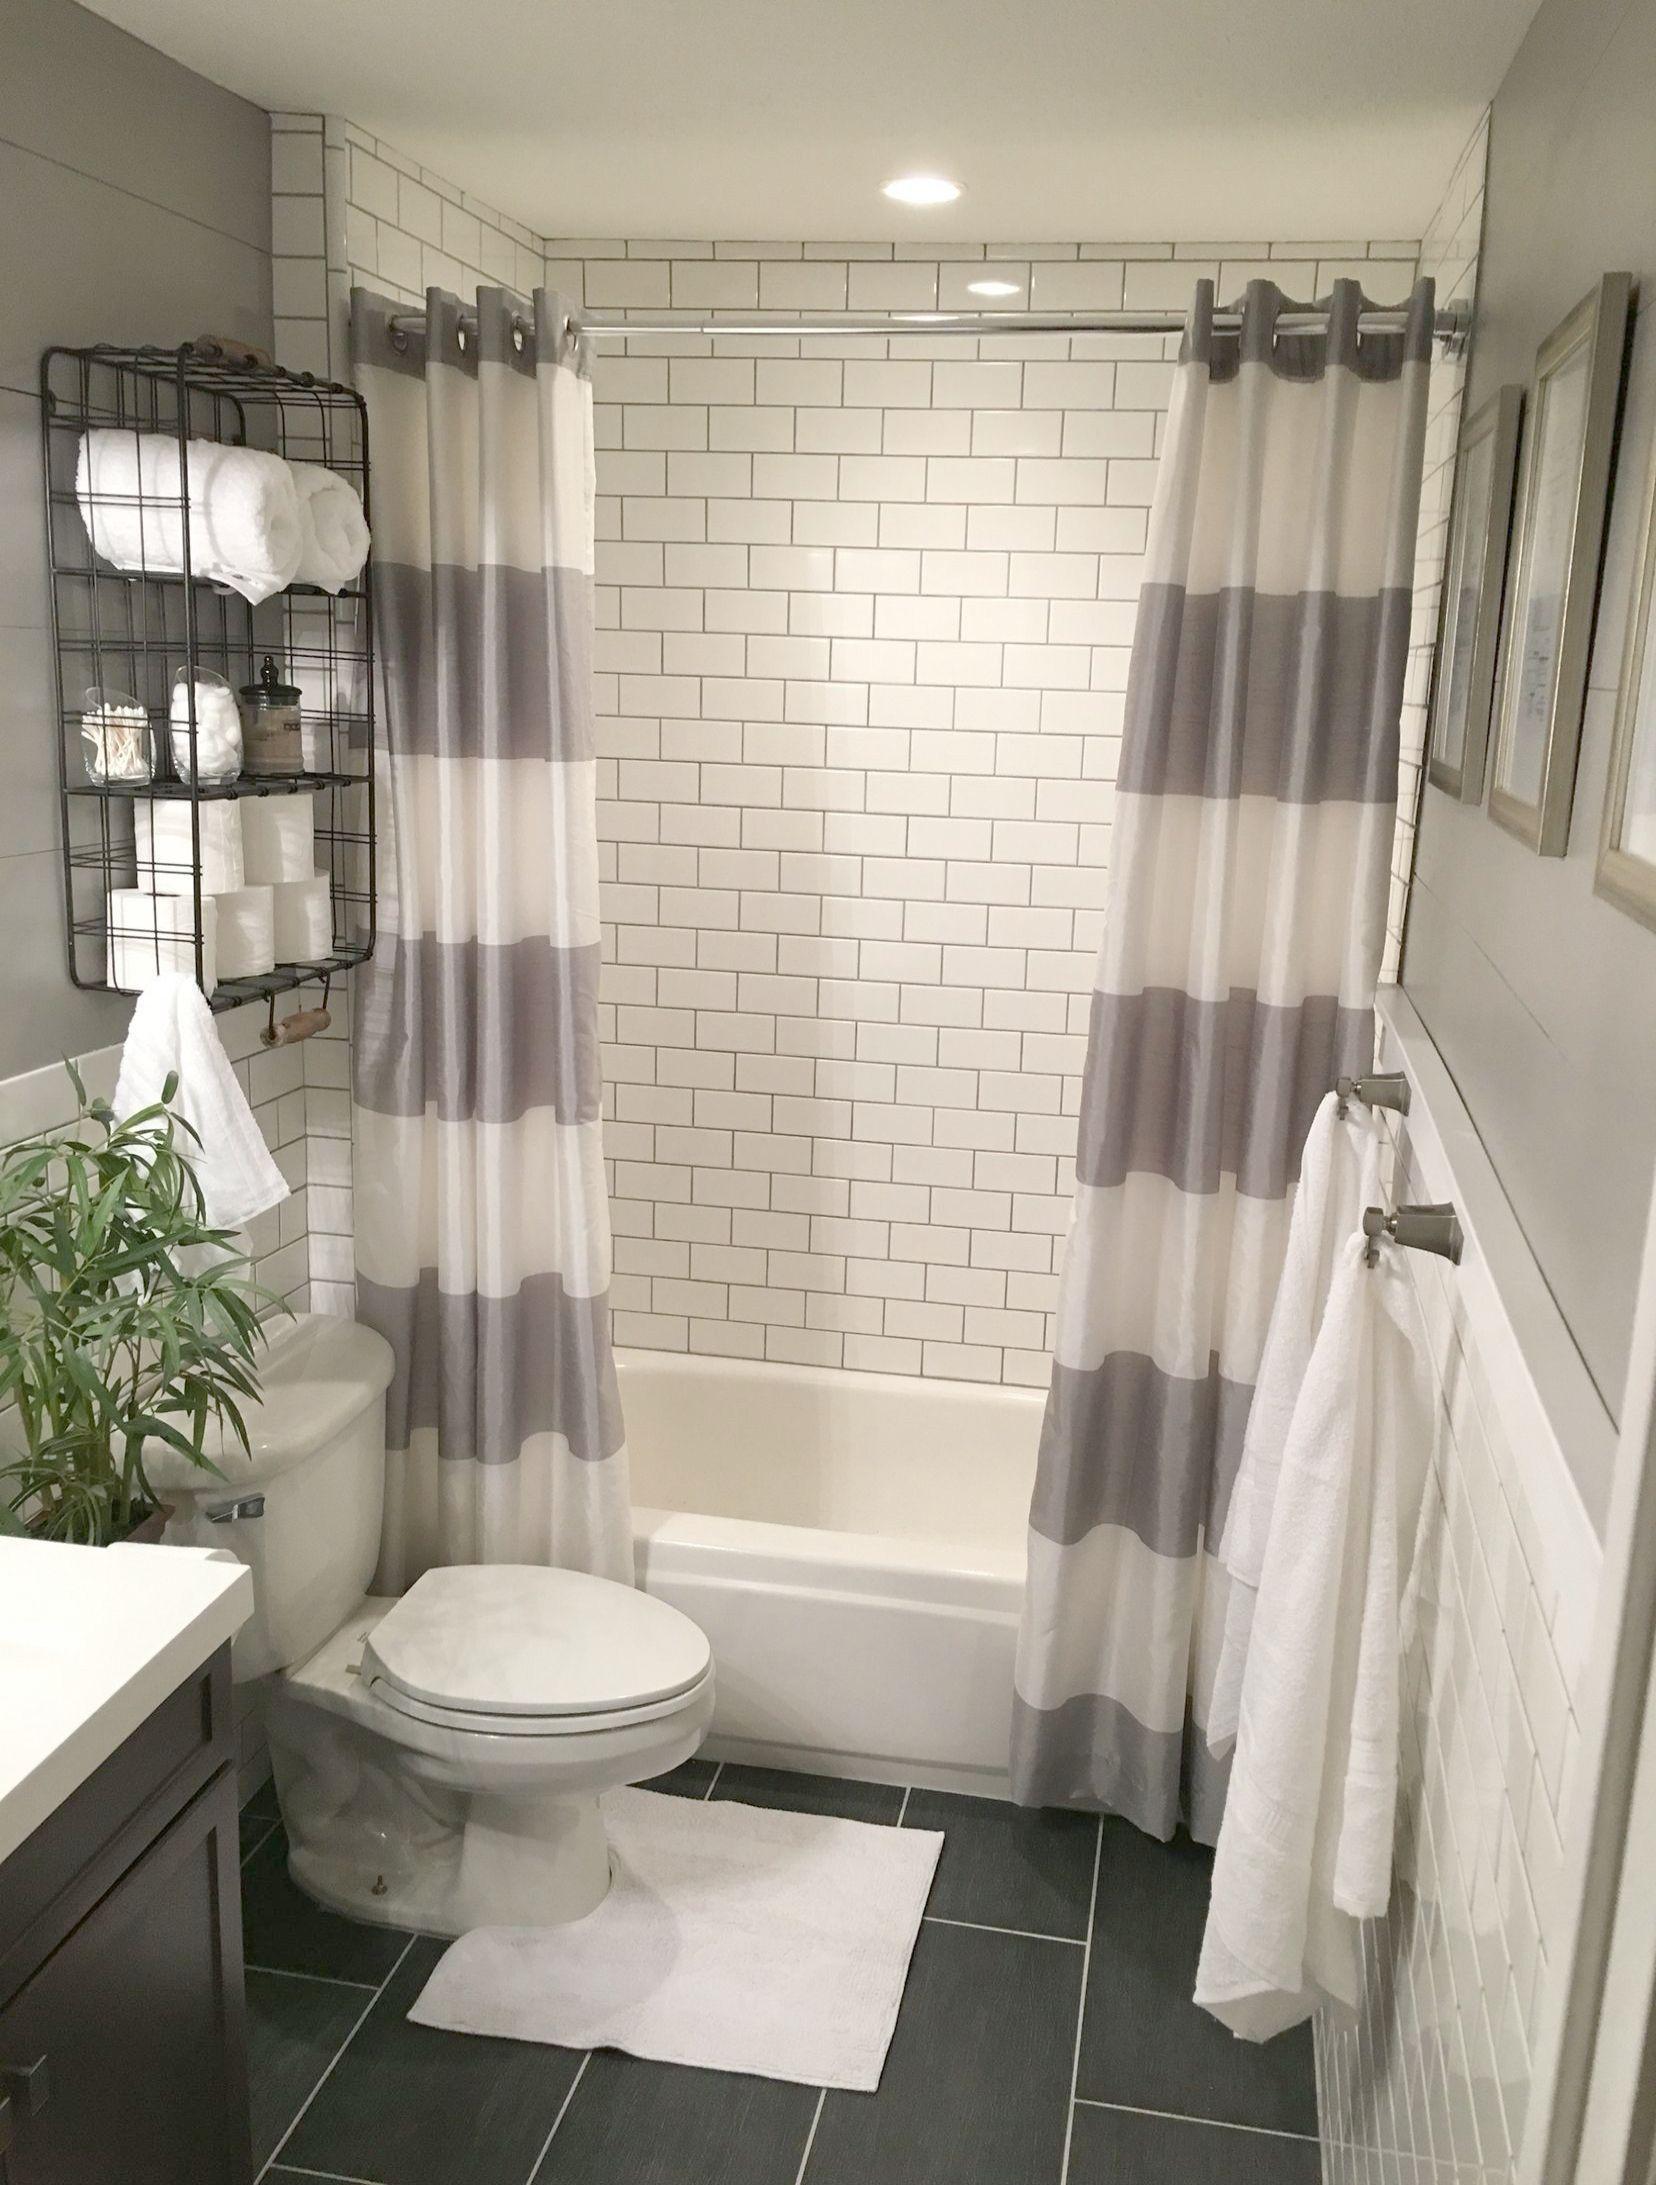 Bathroom Ideas In Pinterest long Bathroom Mirrors Knoxville Tn it